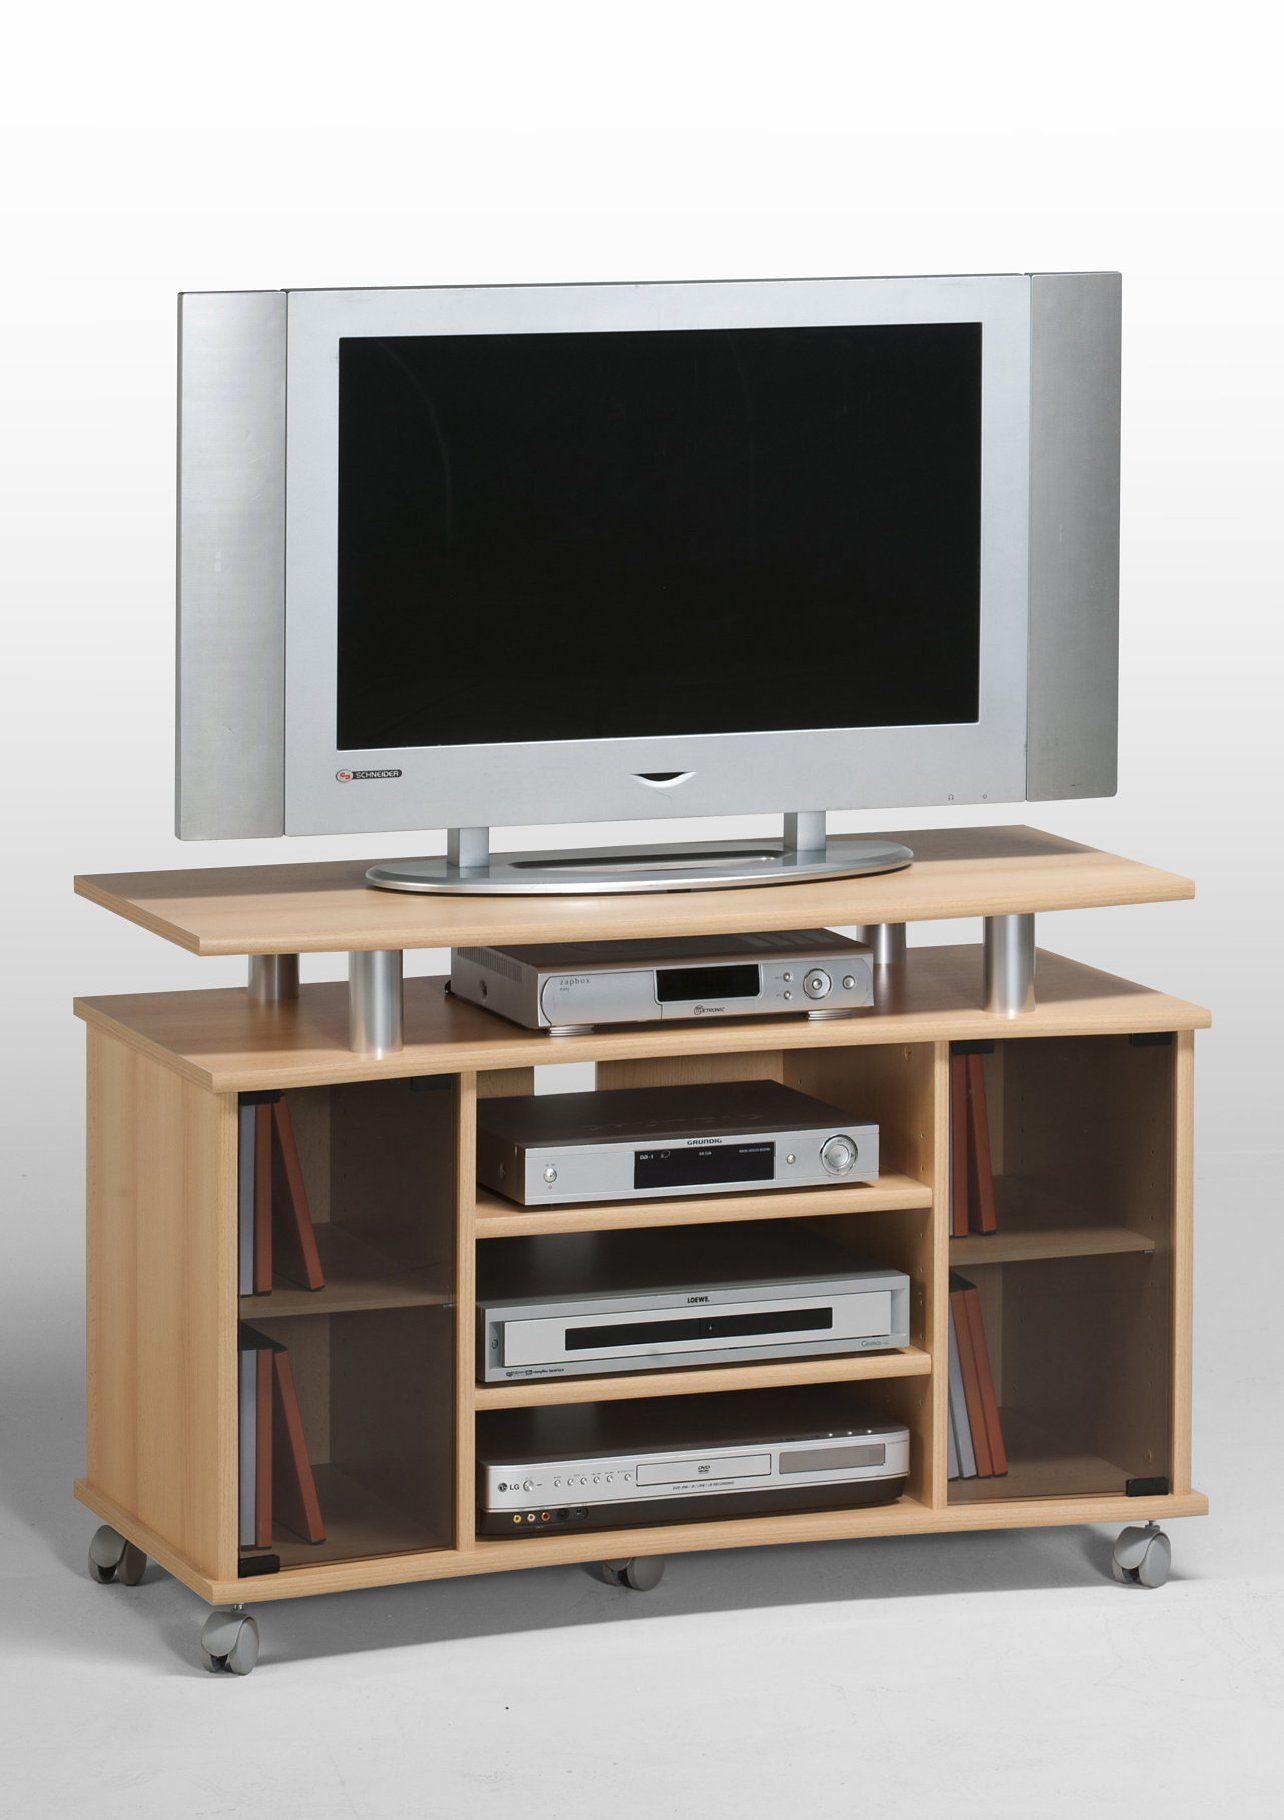 TV-Videowagen, Maja Möbel, Made in Germany Preisvergleich